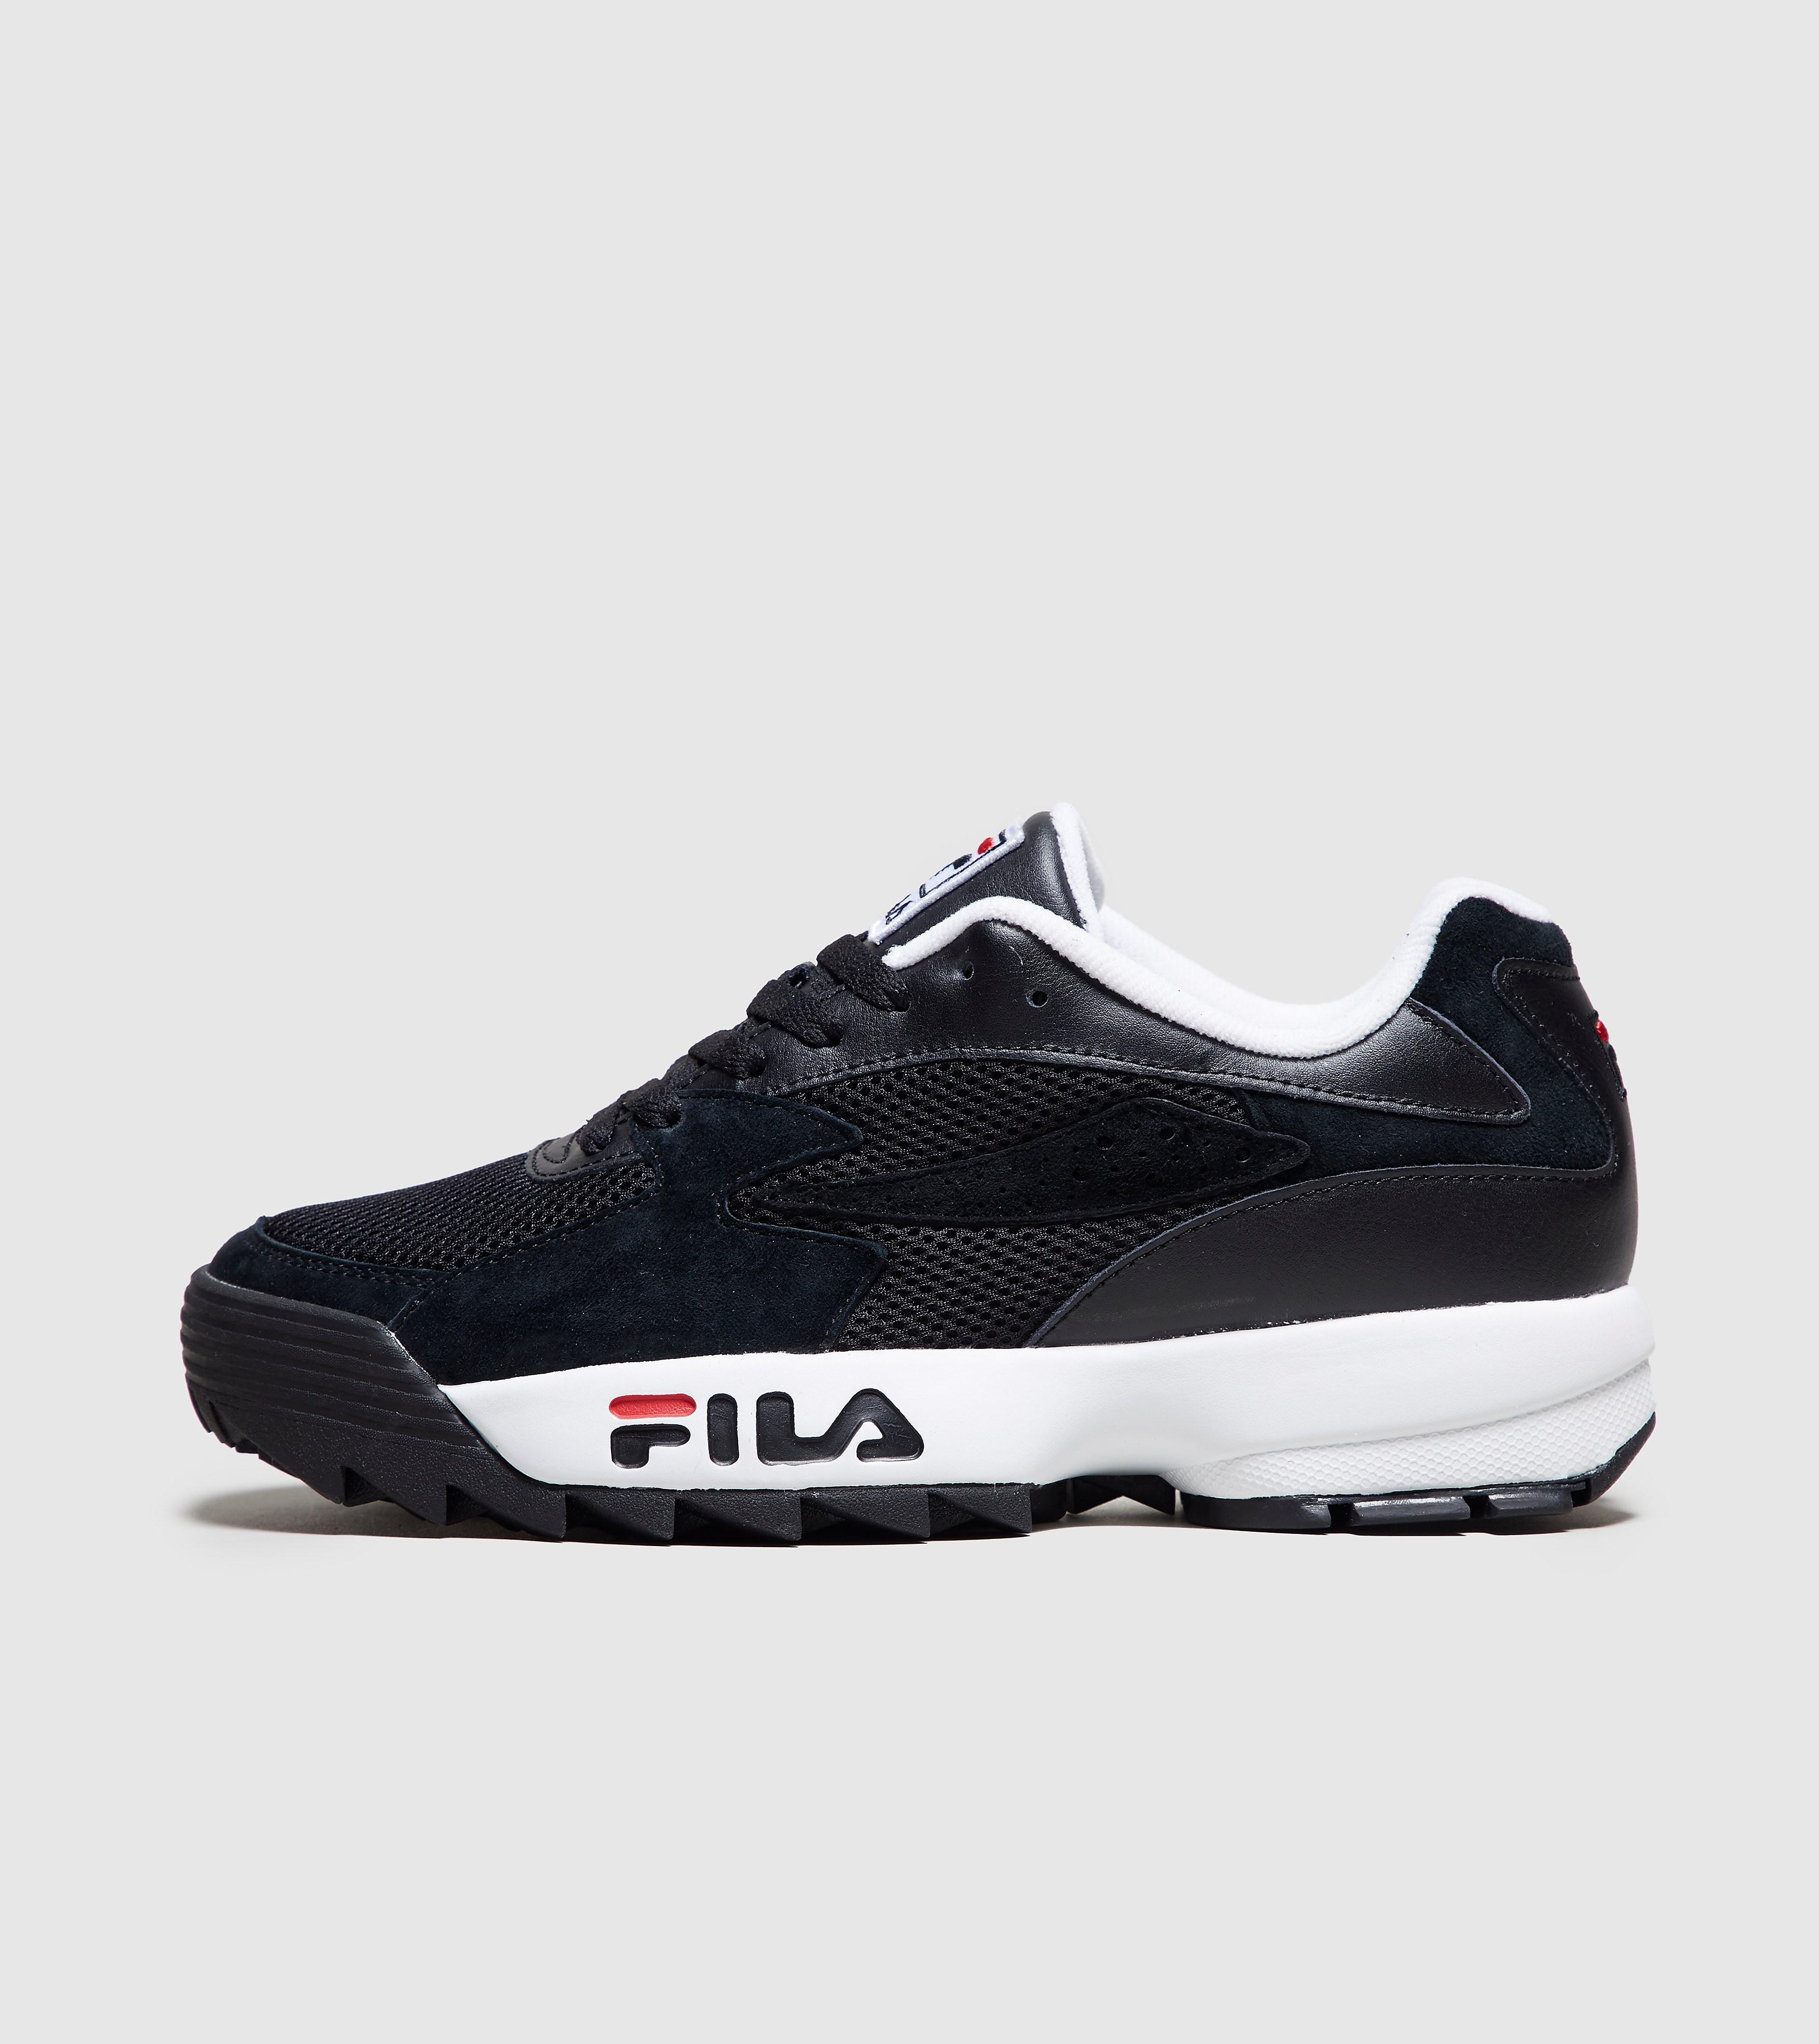 Sneaker Fila Fila Mindruptor Hybrid - size? Exclusive